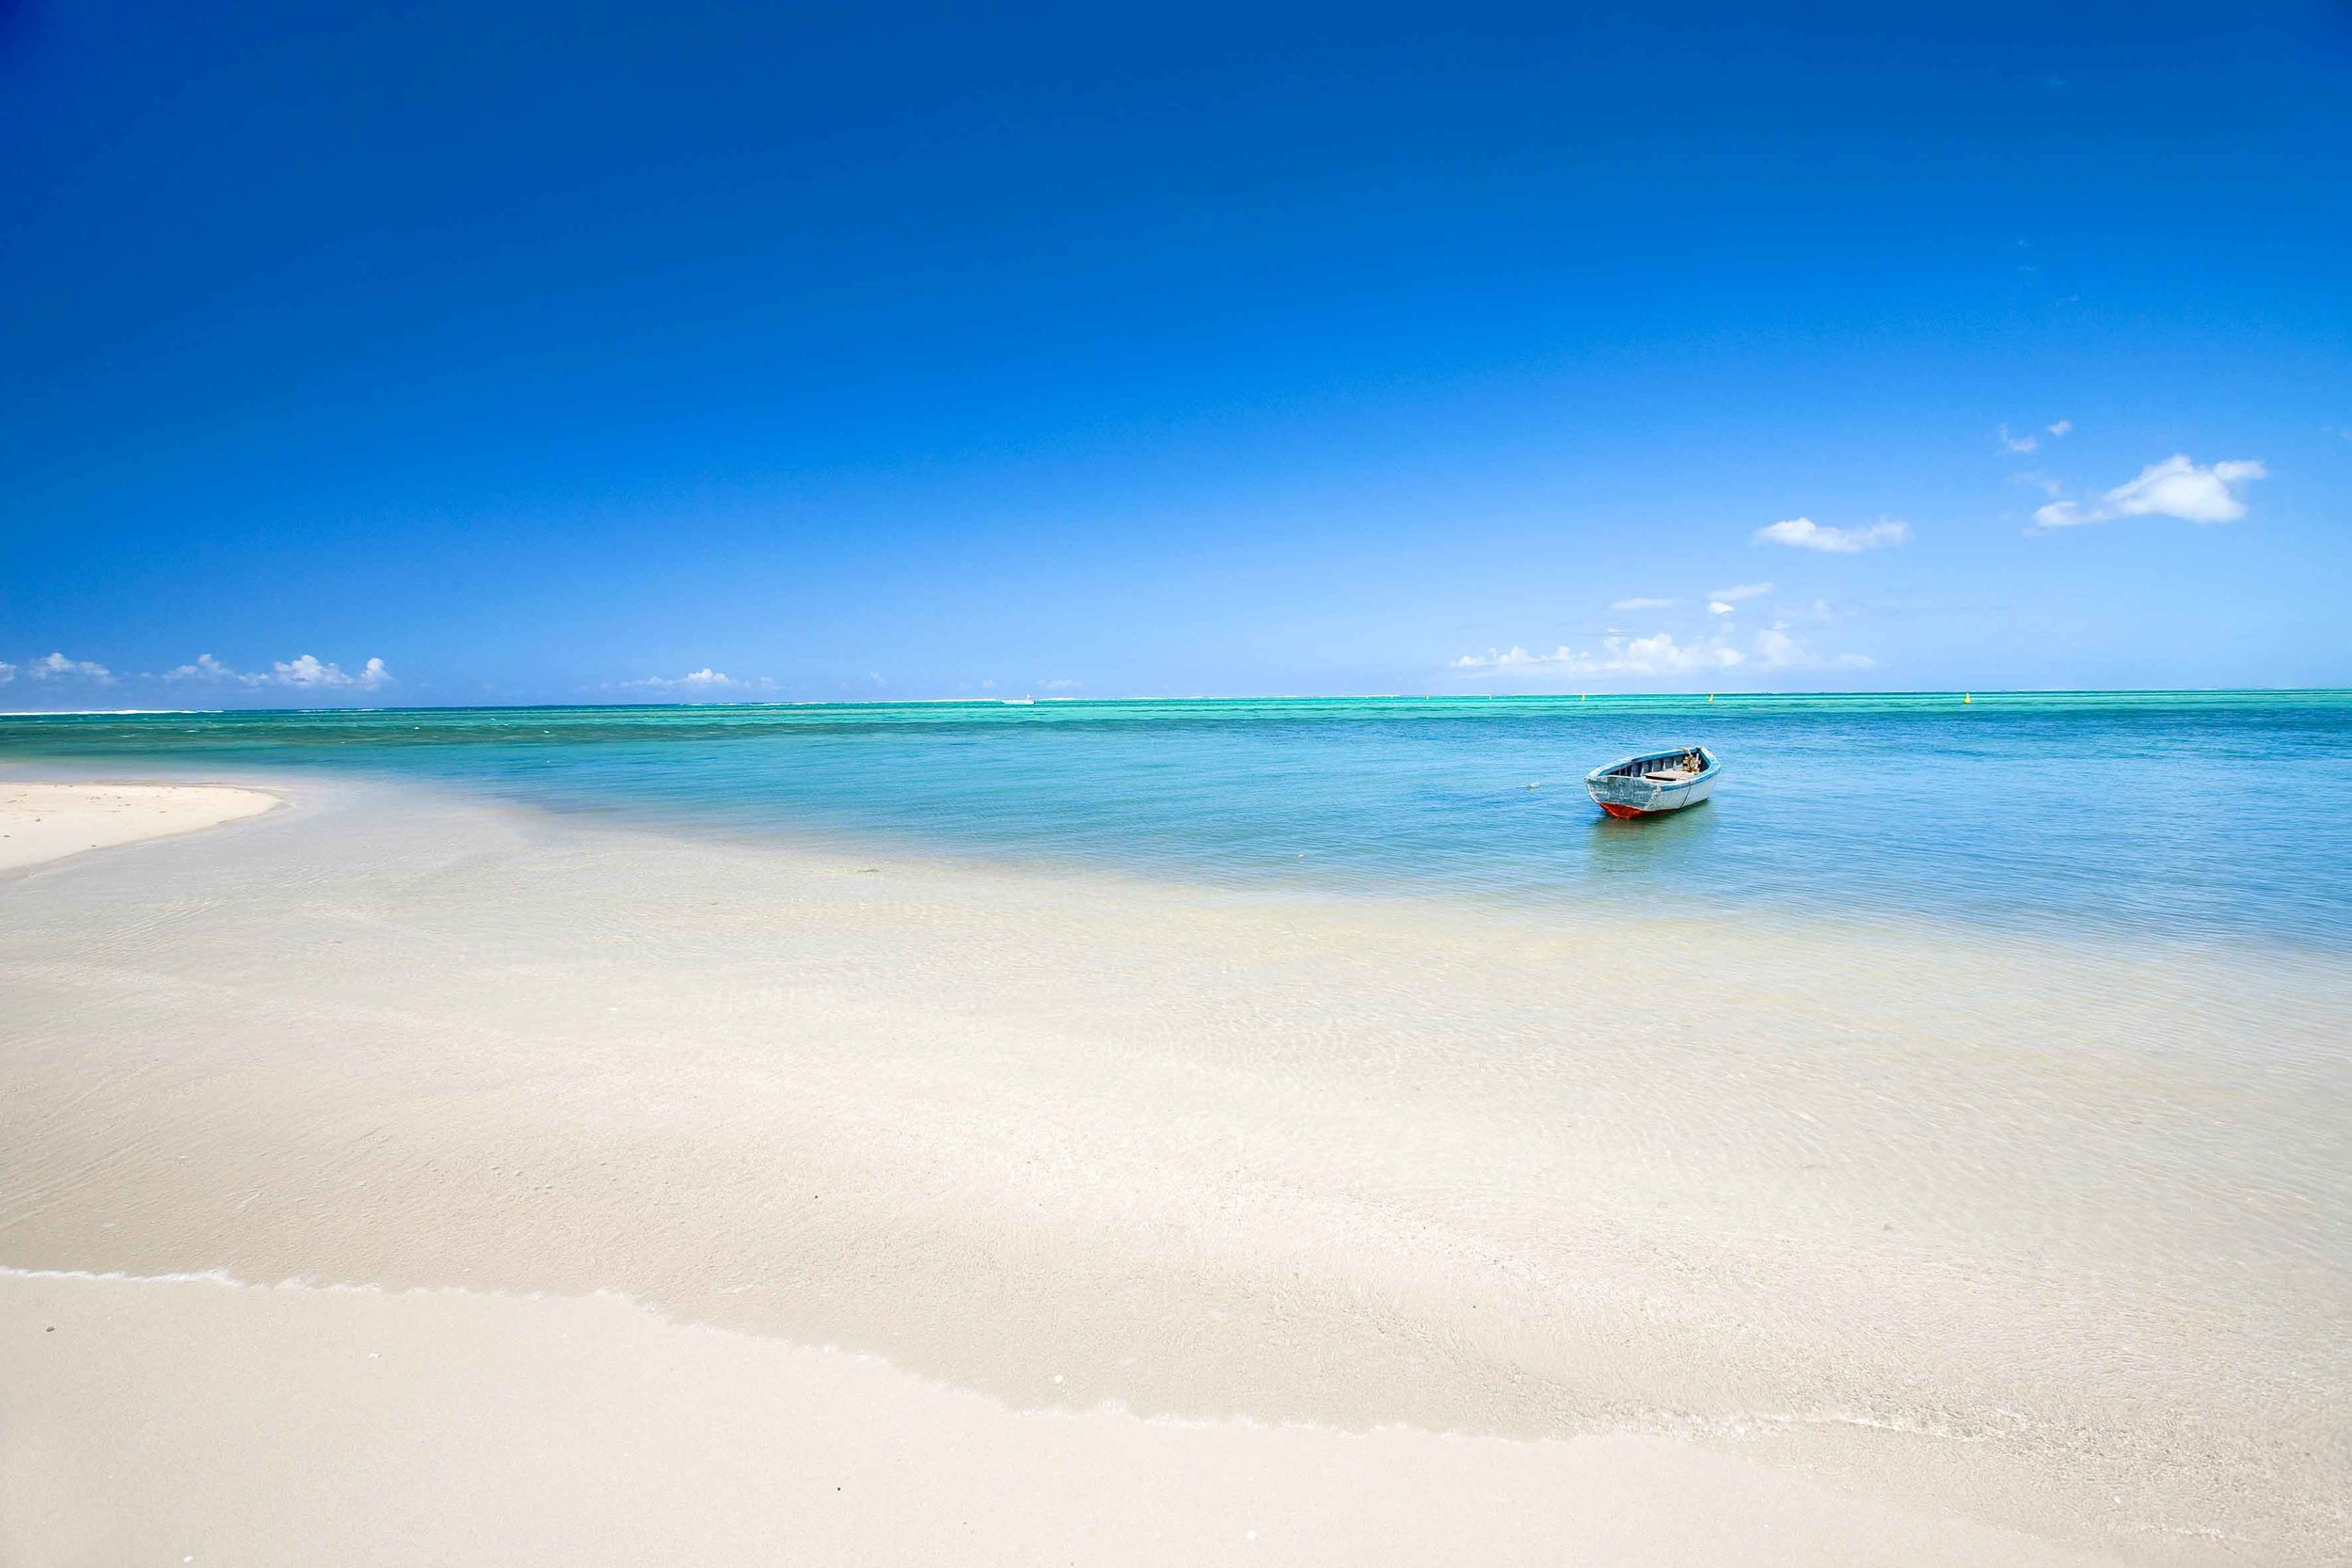 Beach_Boat_Mauritius_EDIT_SMALL.jpg